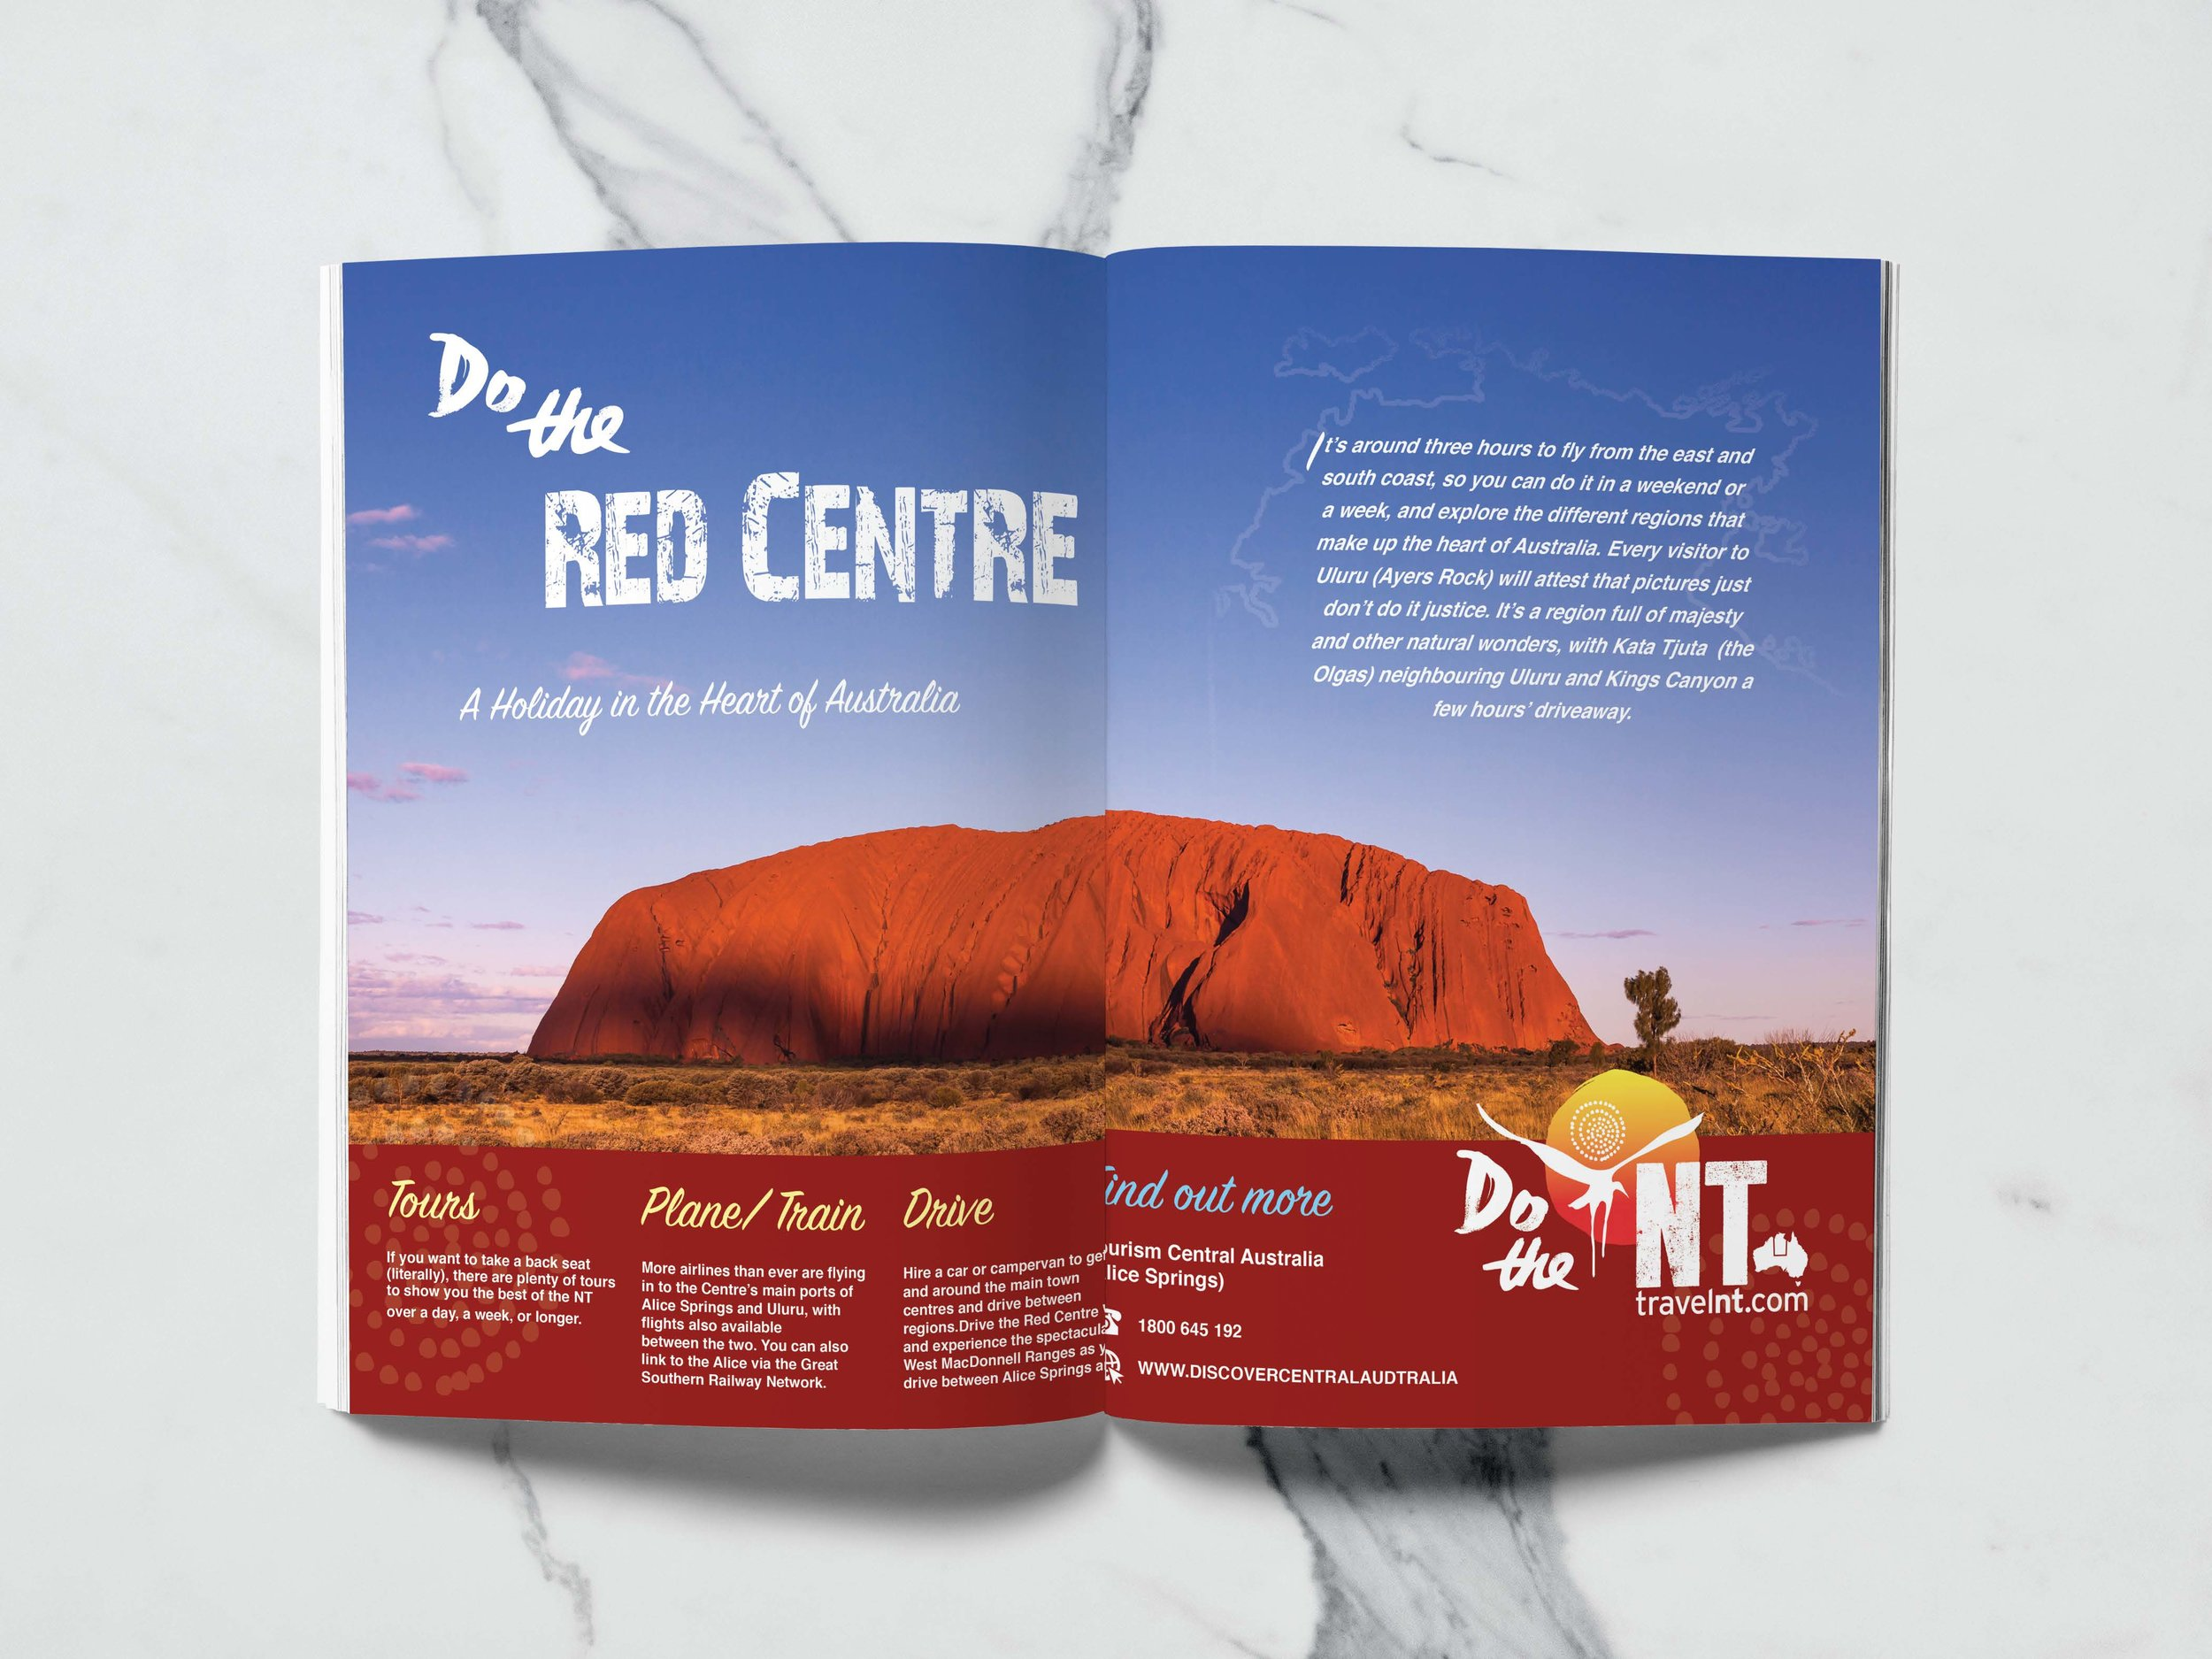 Do The Northern Territory Magazine advertisement